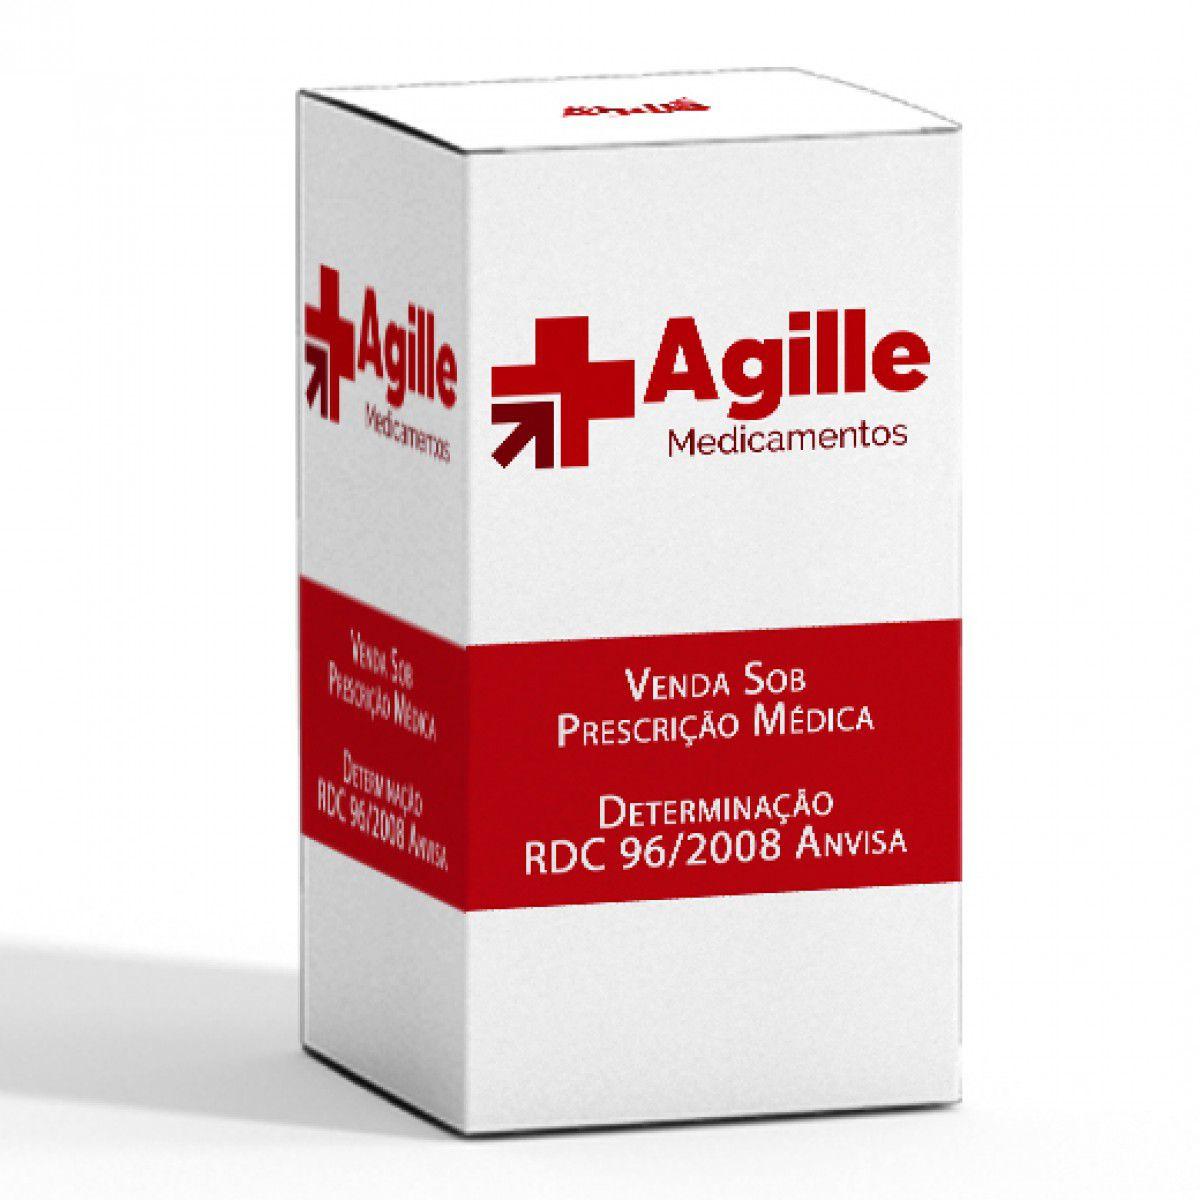 OVIDREL 250 MCG SOL INJ X 0,5ML + CANETA APLIC  - Agille Speciality